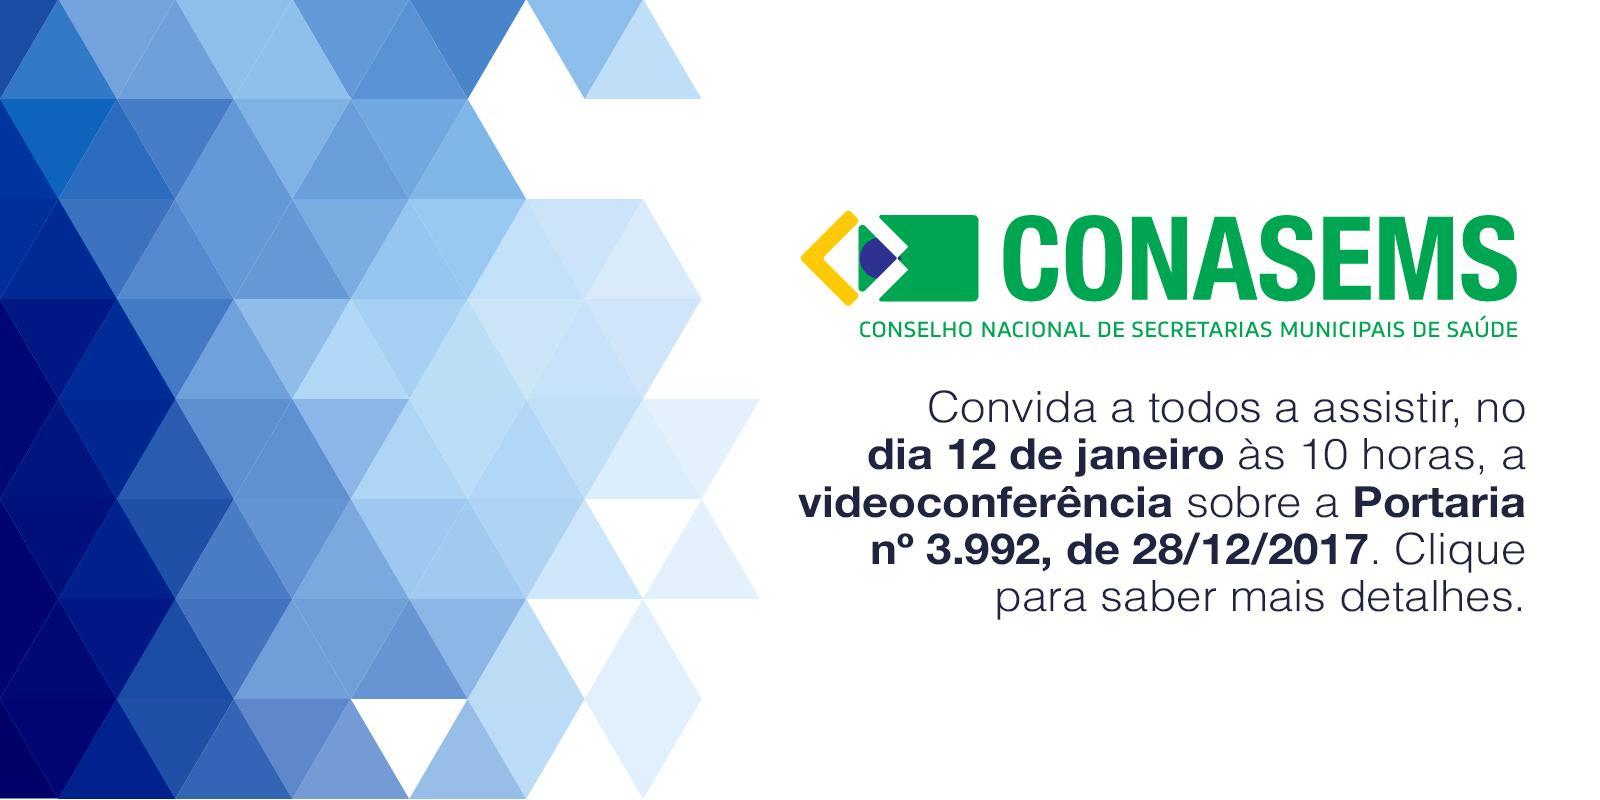 Videoconferência organizada pelo CONASEMS para apresentar e esclarecer dúvidas sobre a Portaria nº 3.992, de 28/12/2017